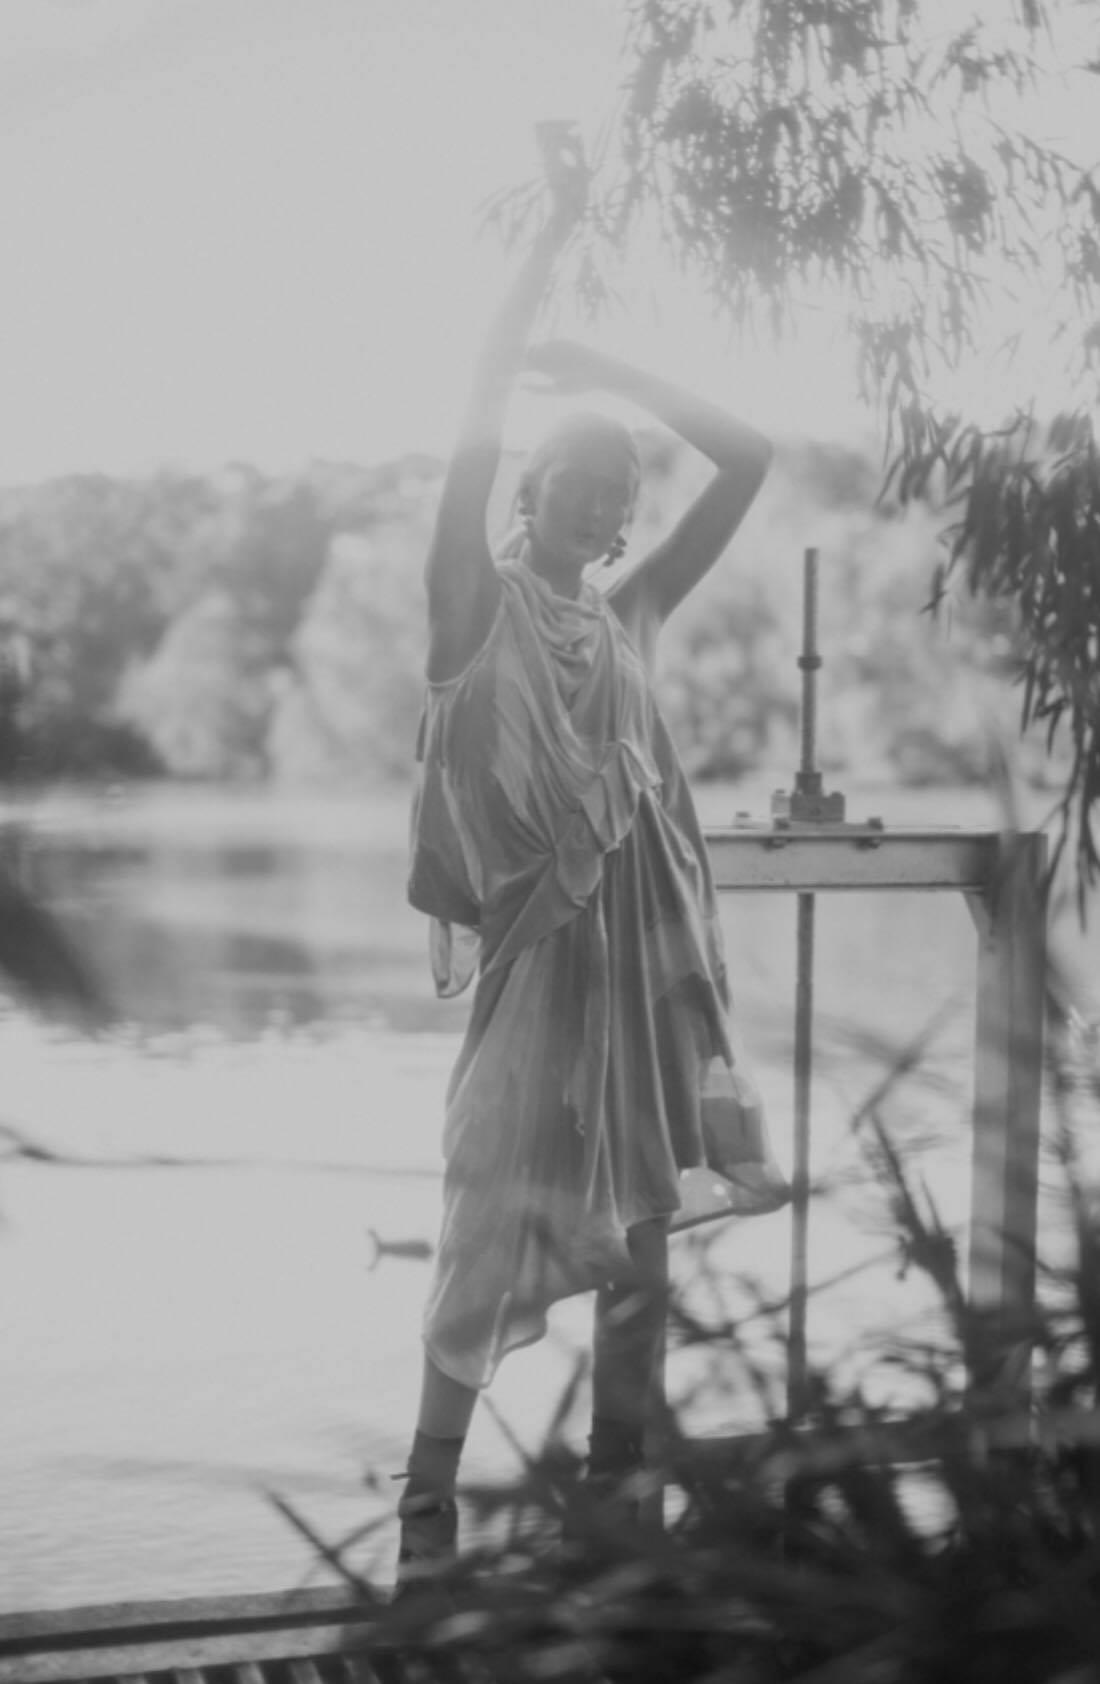 For  @pageone_magazine   The Drape Tuck Velvet Dress Photographer:  @ahsatankilleen   Model:  @chloe.wynne  @debutmanagement   Hair/Makeup:  @hilaryho_makeupartist    @stylist :  @paigemarygrace